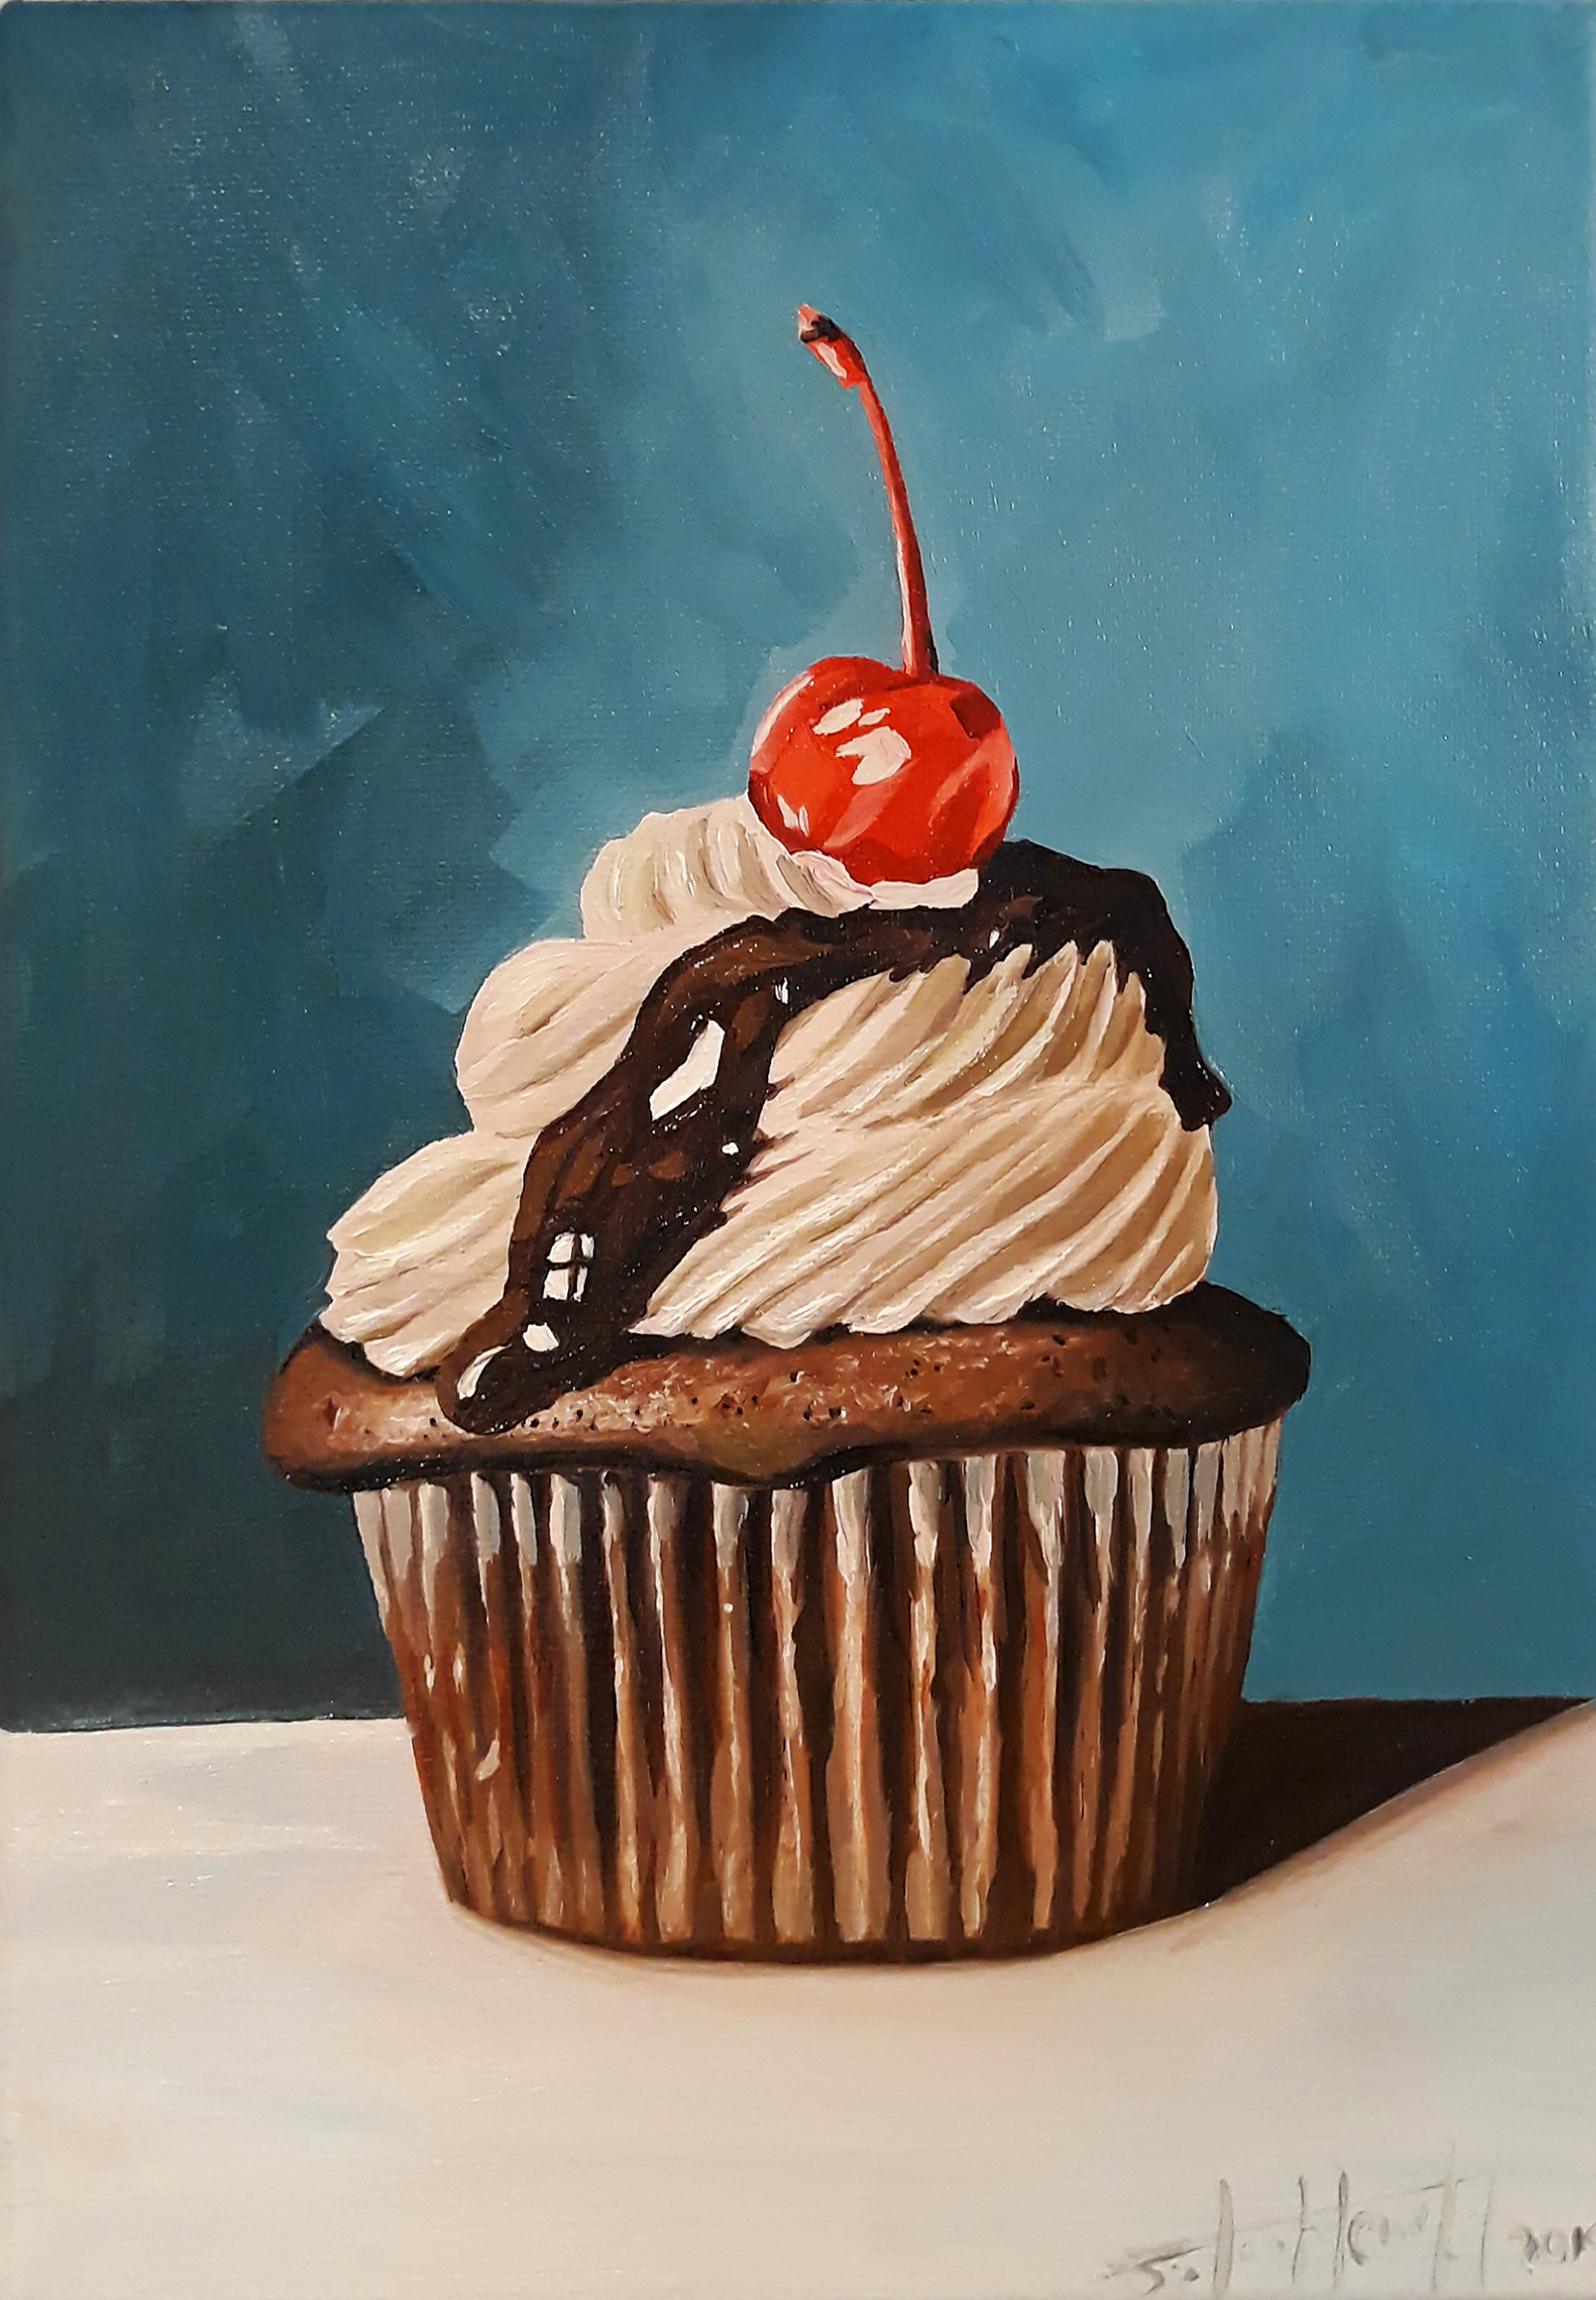 Cupcake #2, 2019